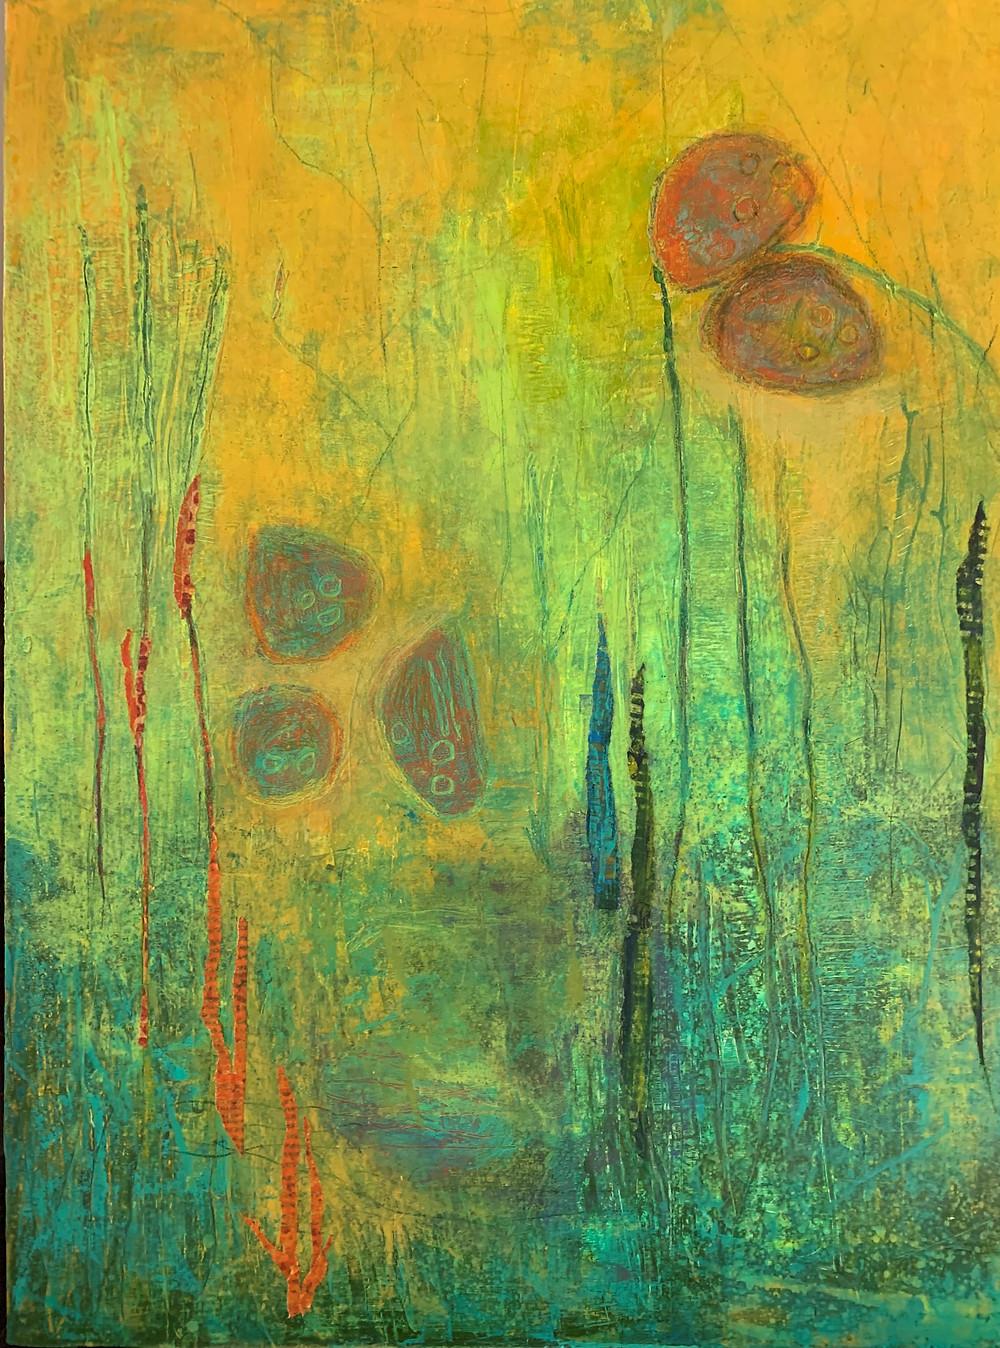 Lotus Pond, Acrylic on cradled panel, 12X16